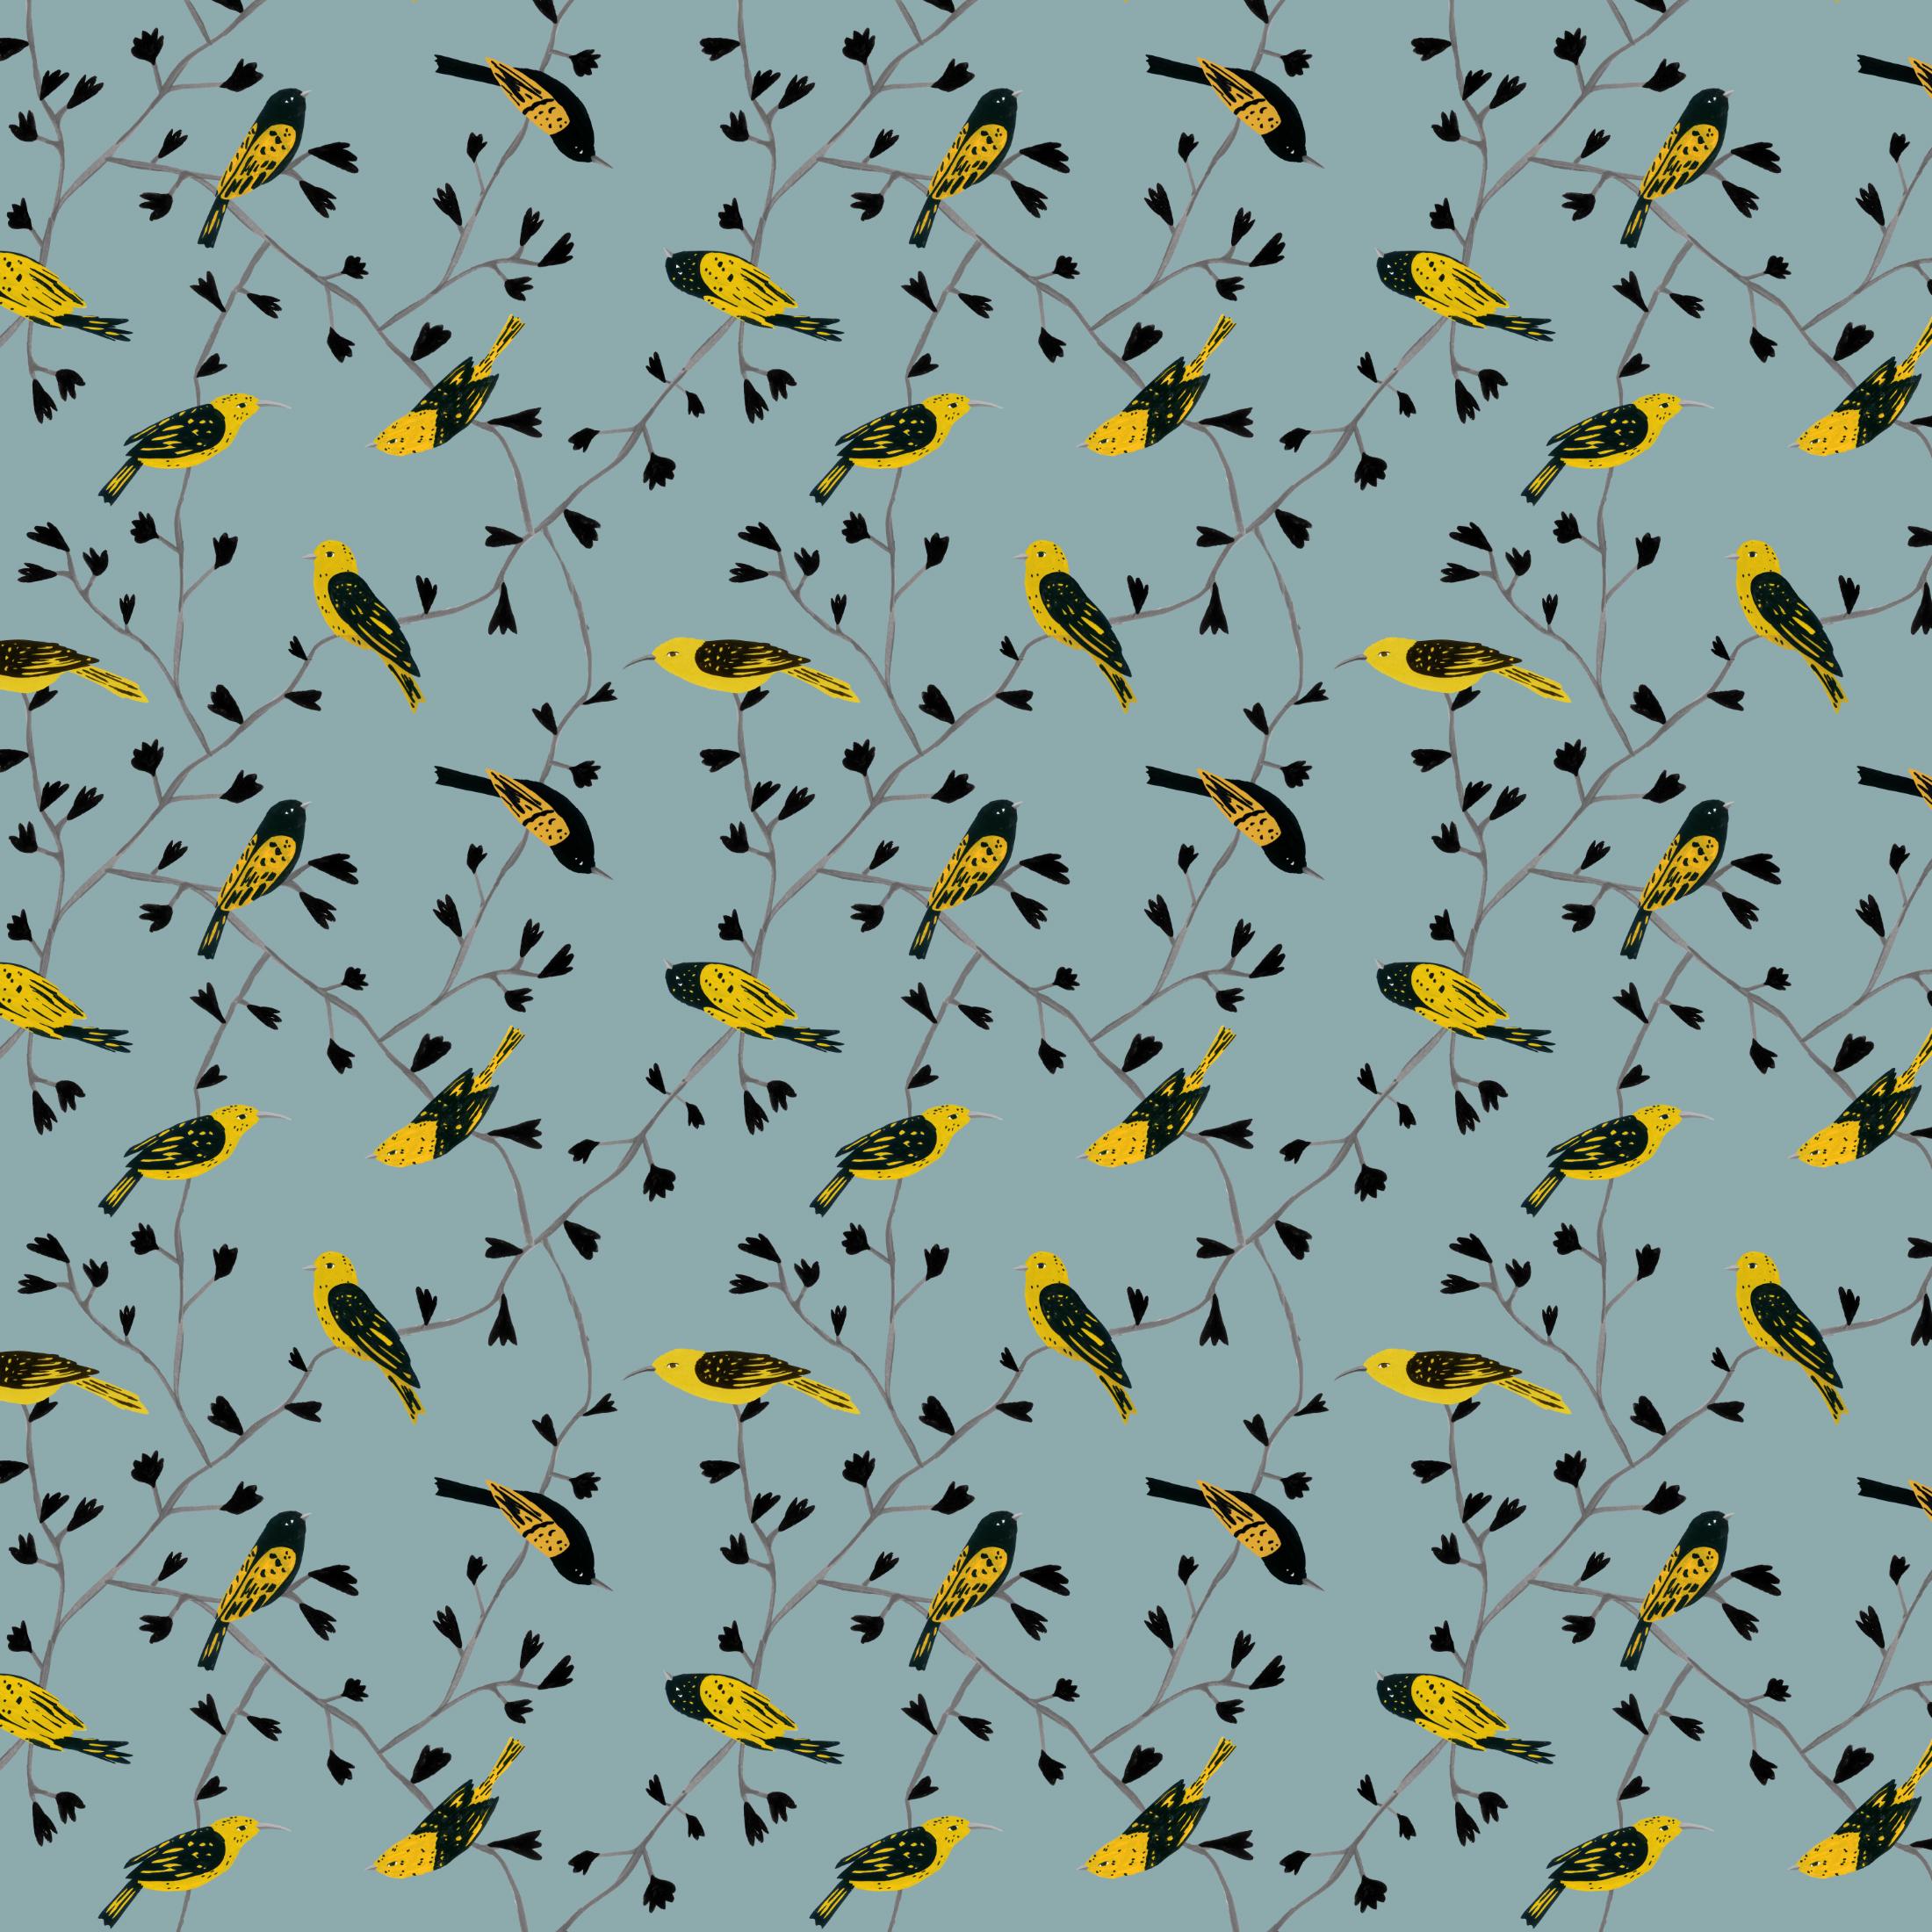 yellow birds in vines pattern